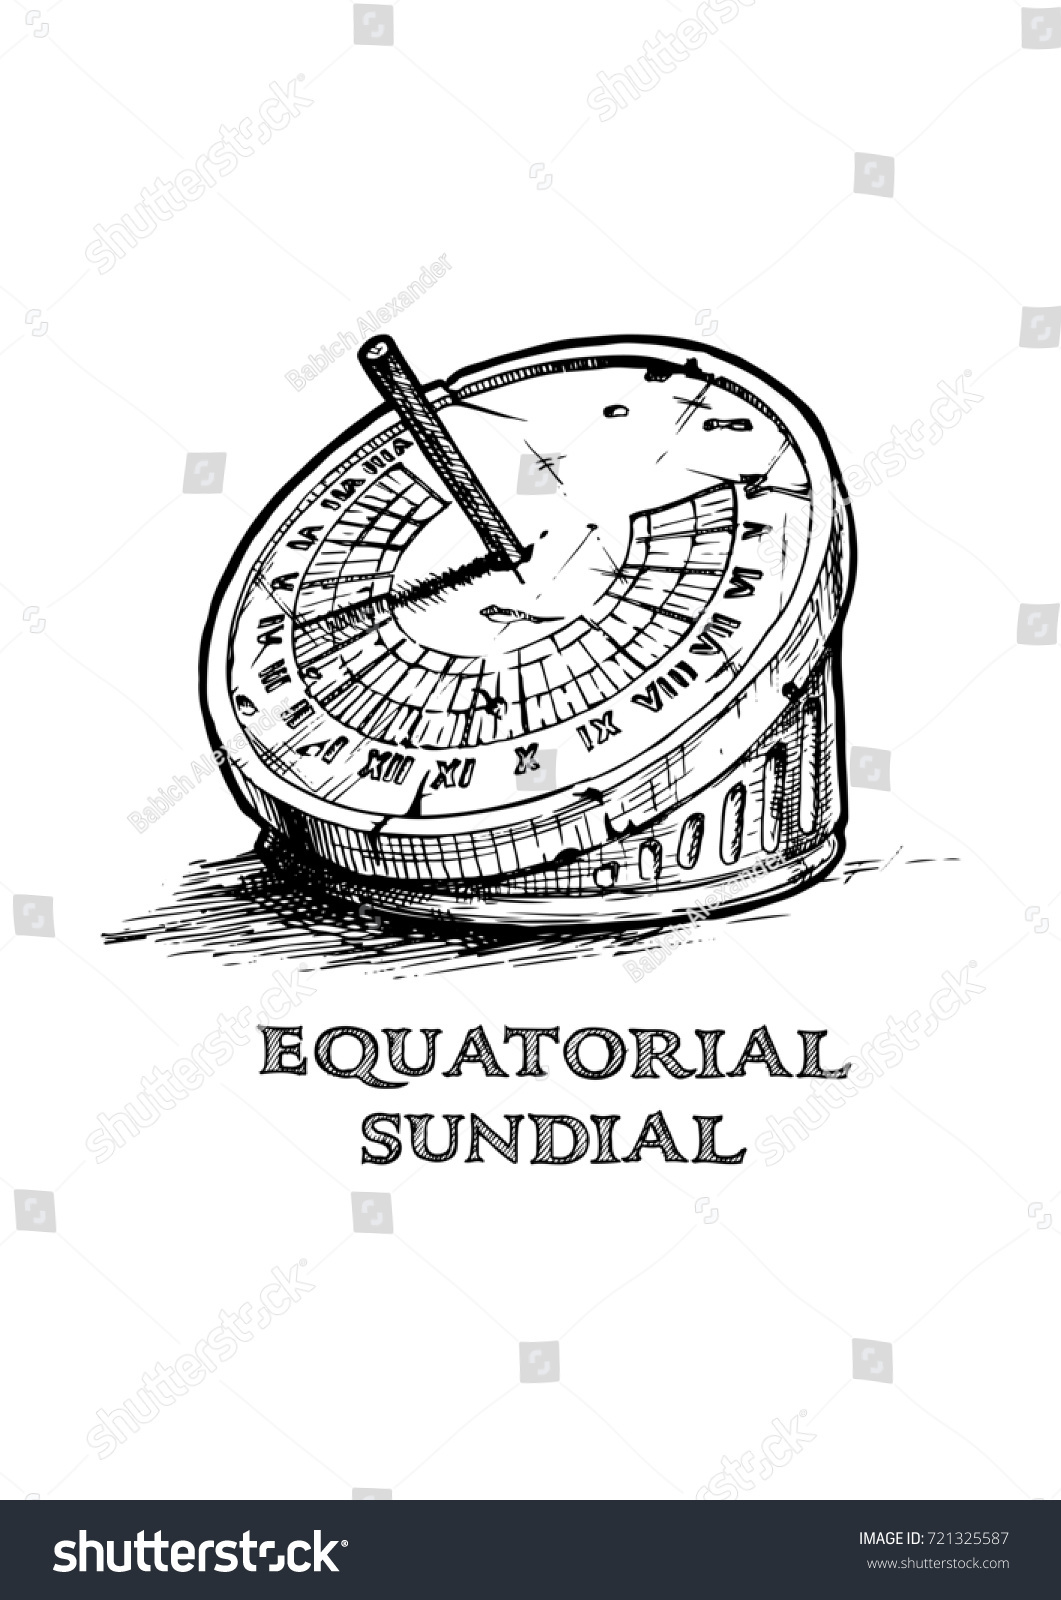 Hand Drawn Illustration Equatorial Sundial Vintage Stock ...